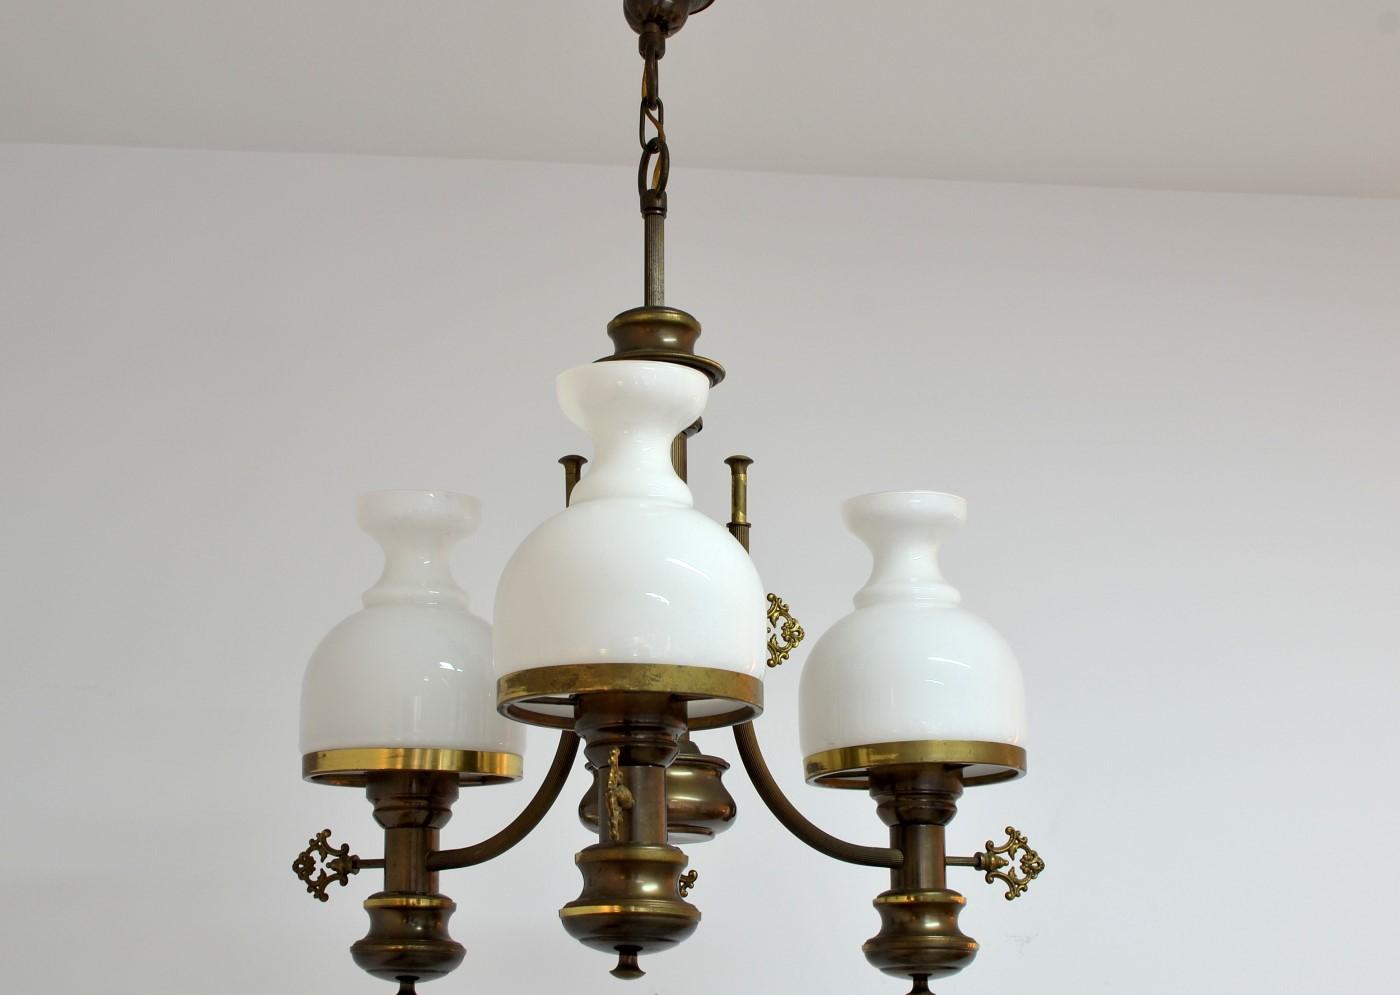 candelabru din alama bronz si sticla opalina magazin antichitati bucuresti online anticariat. Black Bedroom Furniture Sets. Home Design Ideas